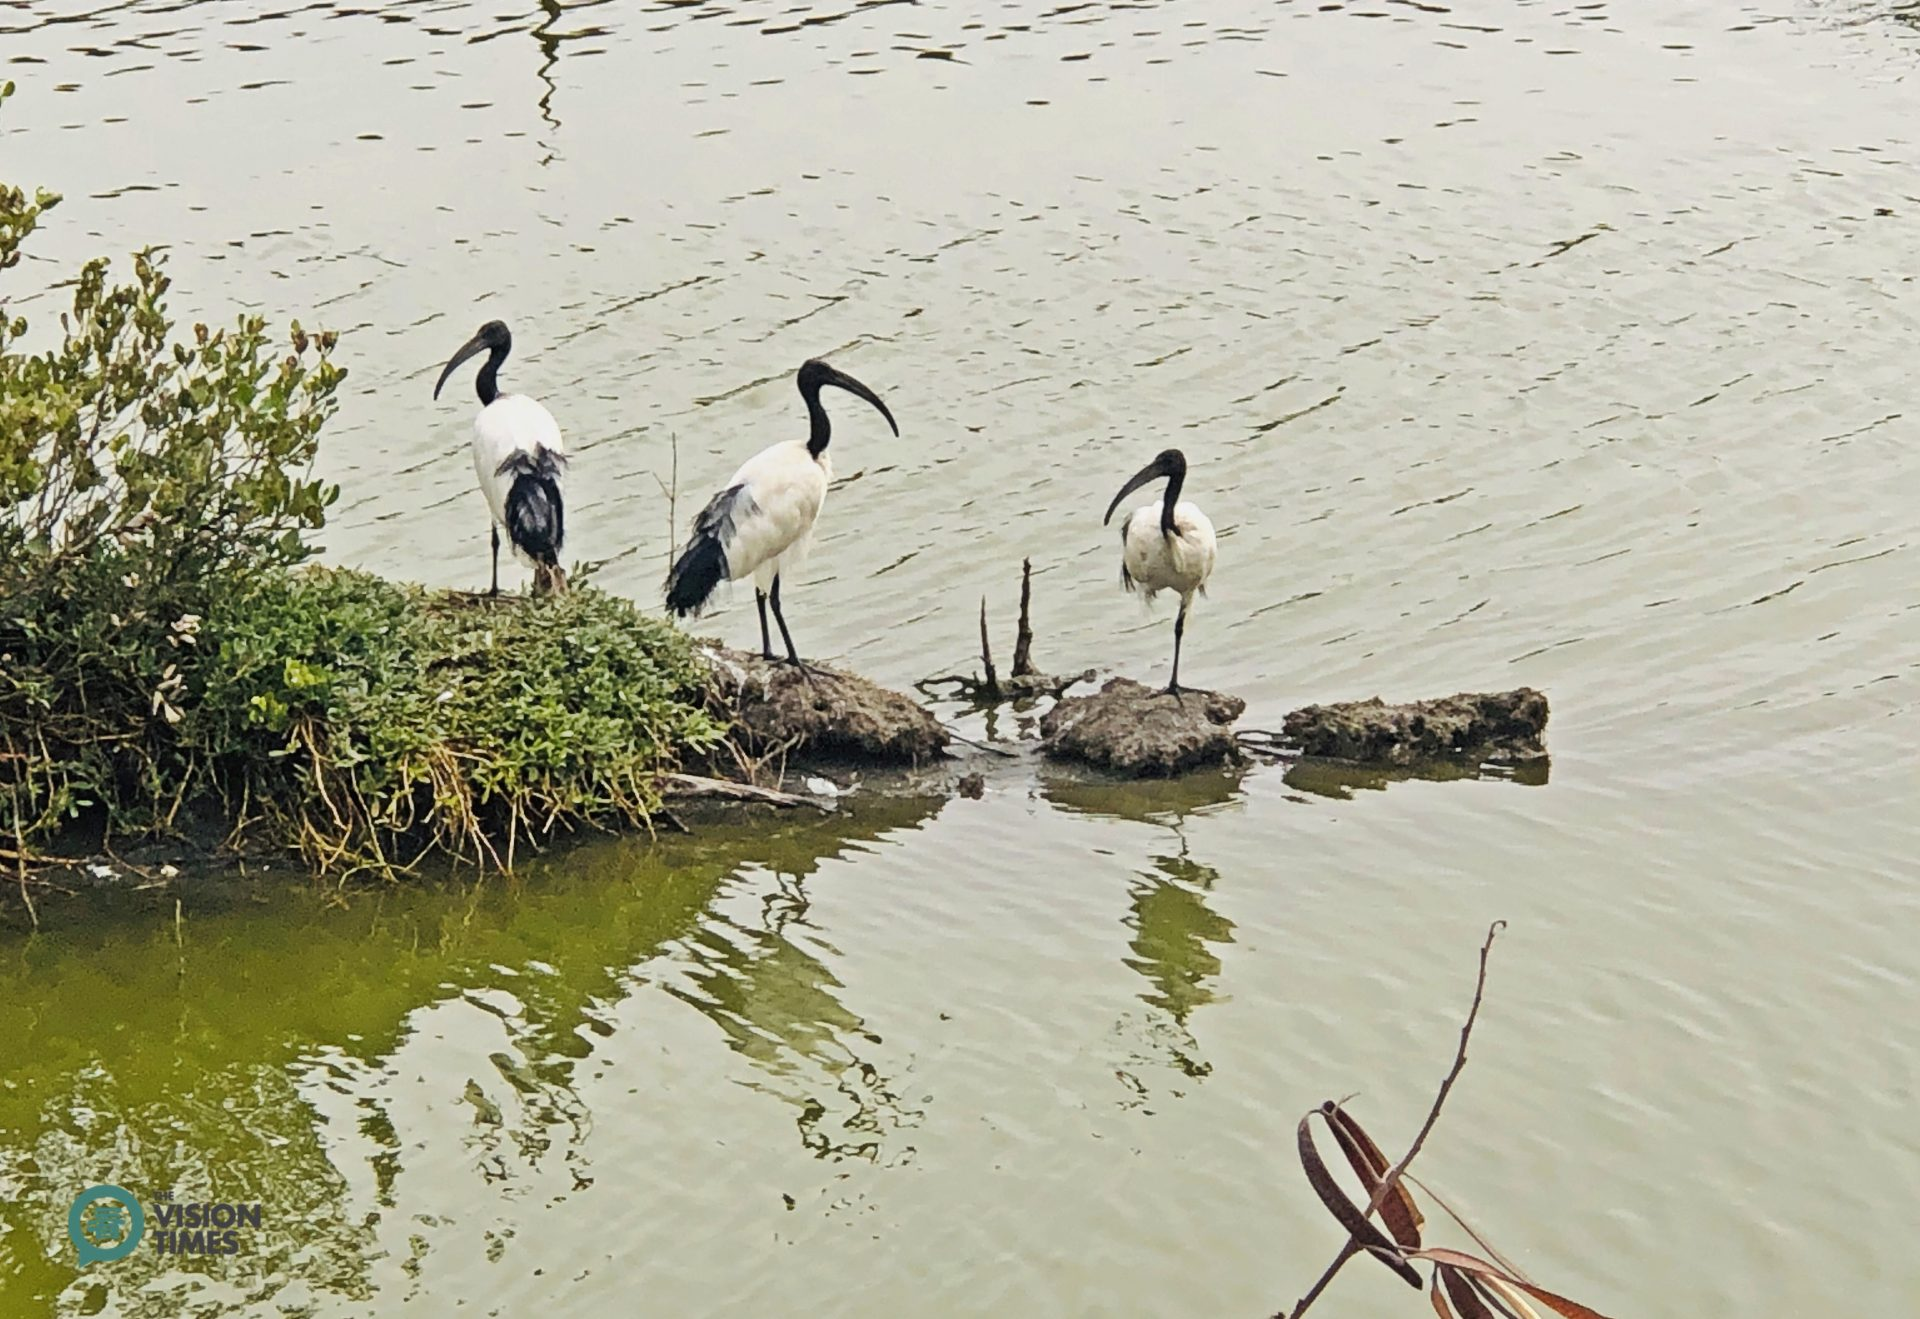 Visitors can spot many Sacred Ibis (埃及聖䴉 Threskiomis aethiopicus) in Aogu Wetland. (Image: Billy Shyu / Vision Times)